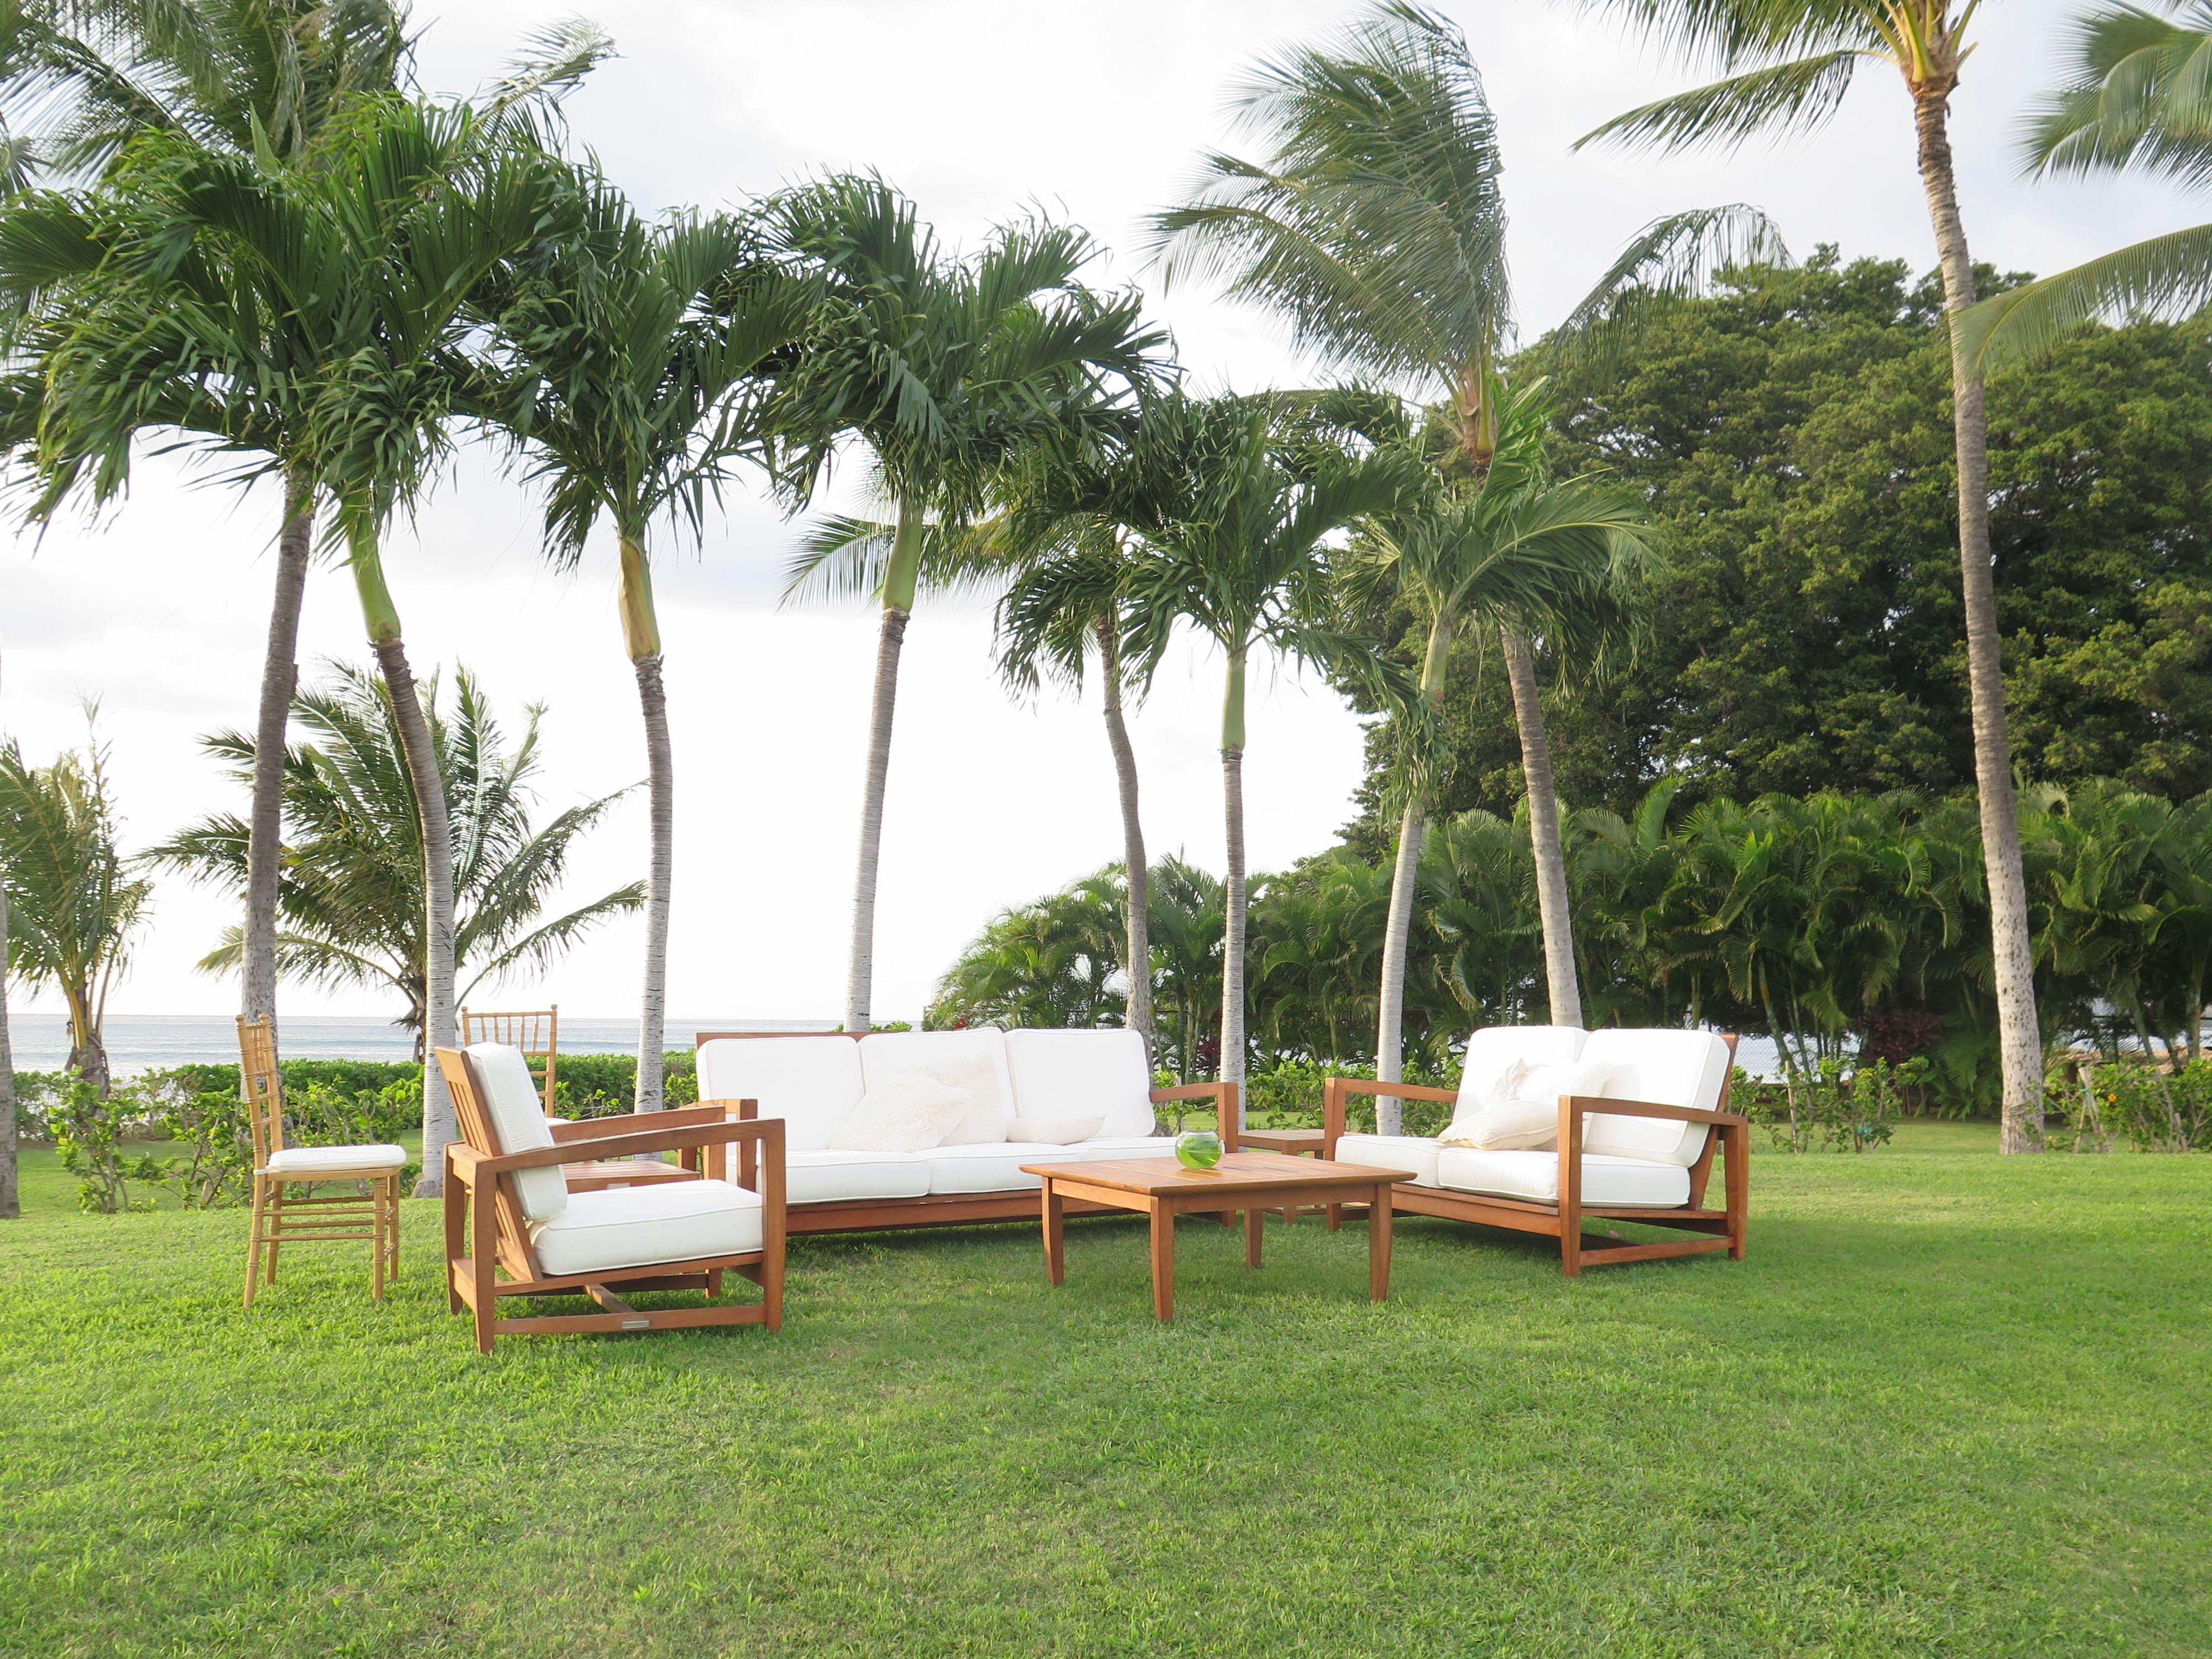 Our couple's beautiful wedding lounge at Paradise Cove. Contact Hawaii Weddings by Tori Rogers www.hawaiianweddings.net